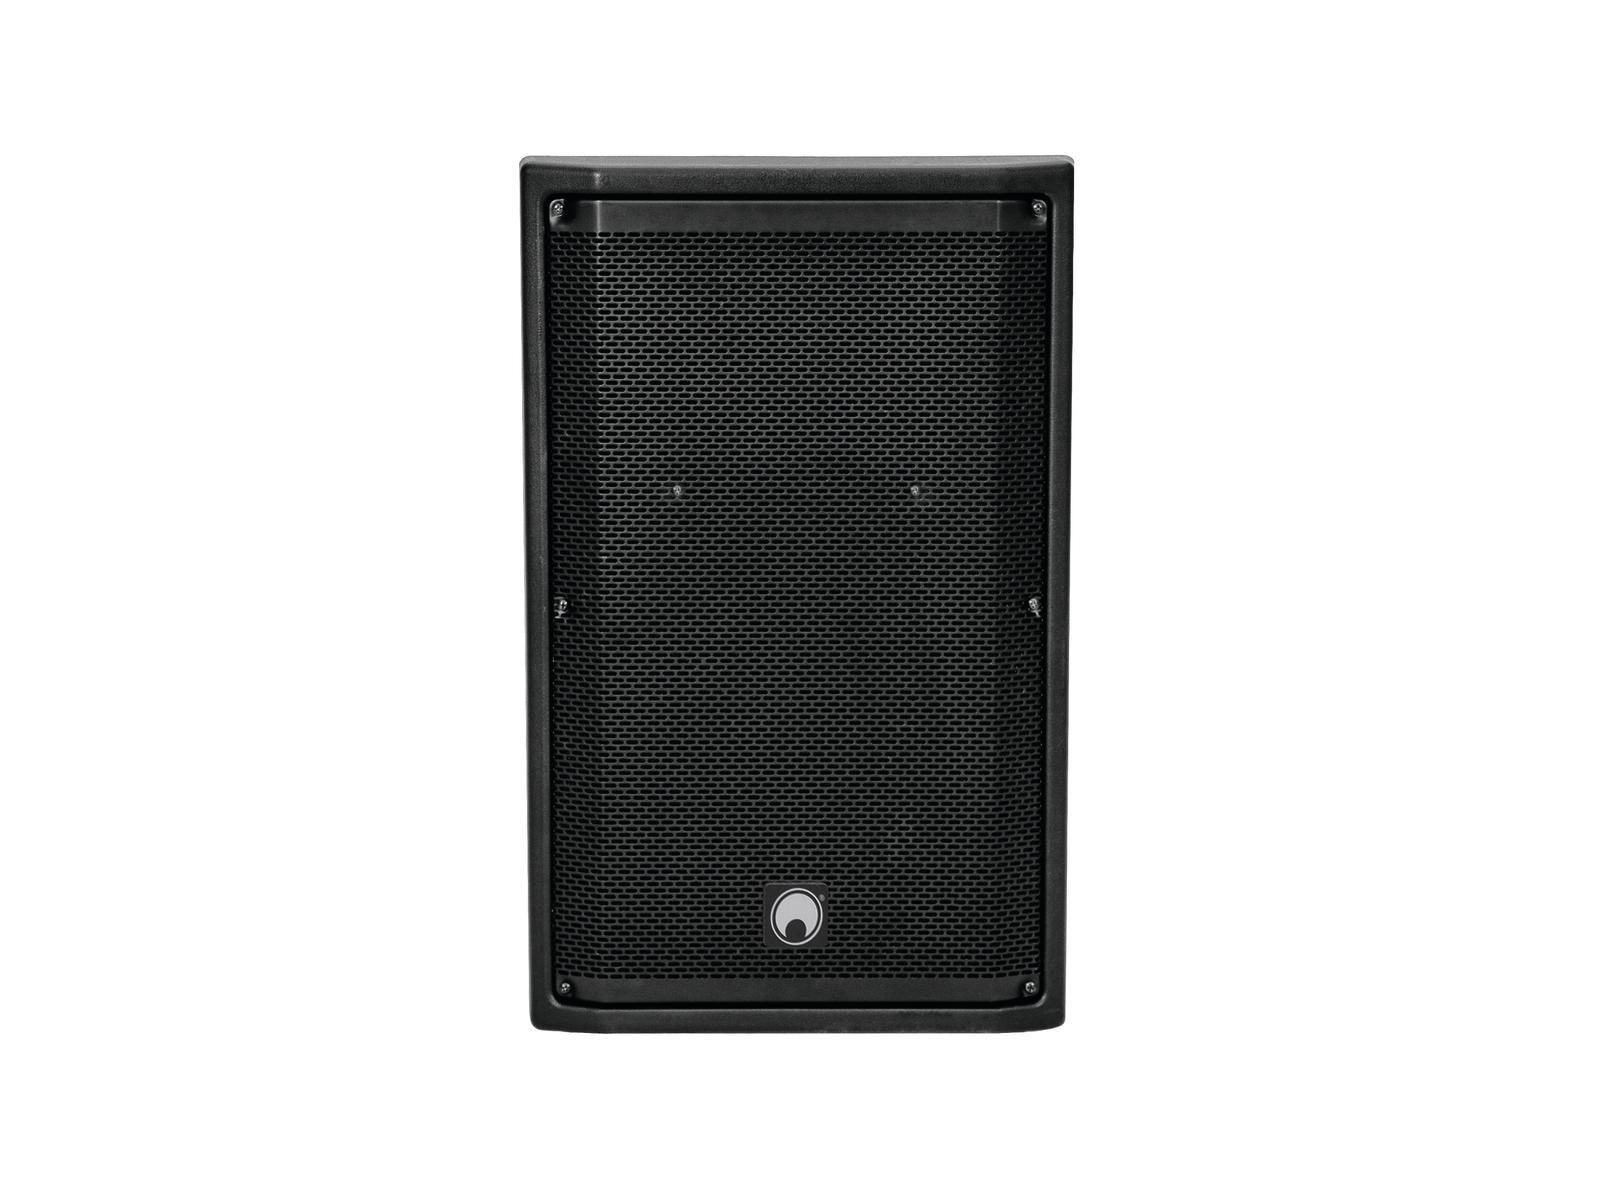 OMNITRONIC XKB-212A 2-Wege Lautsprecher, aktiv, DSP